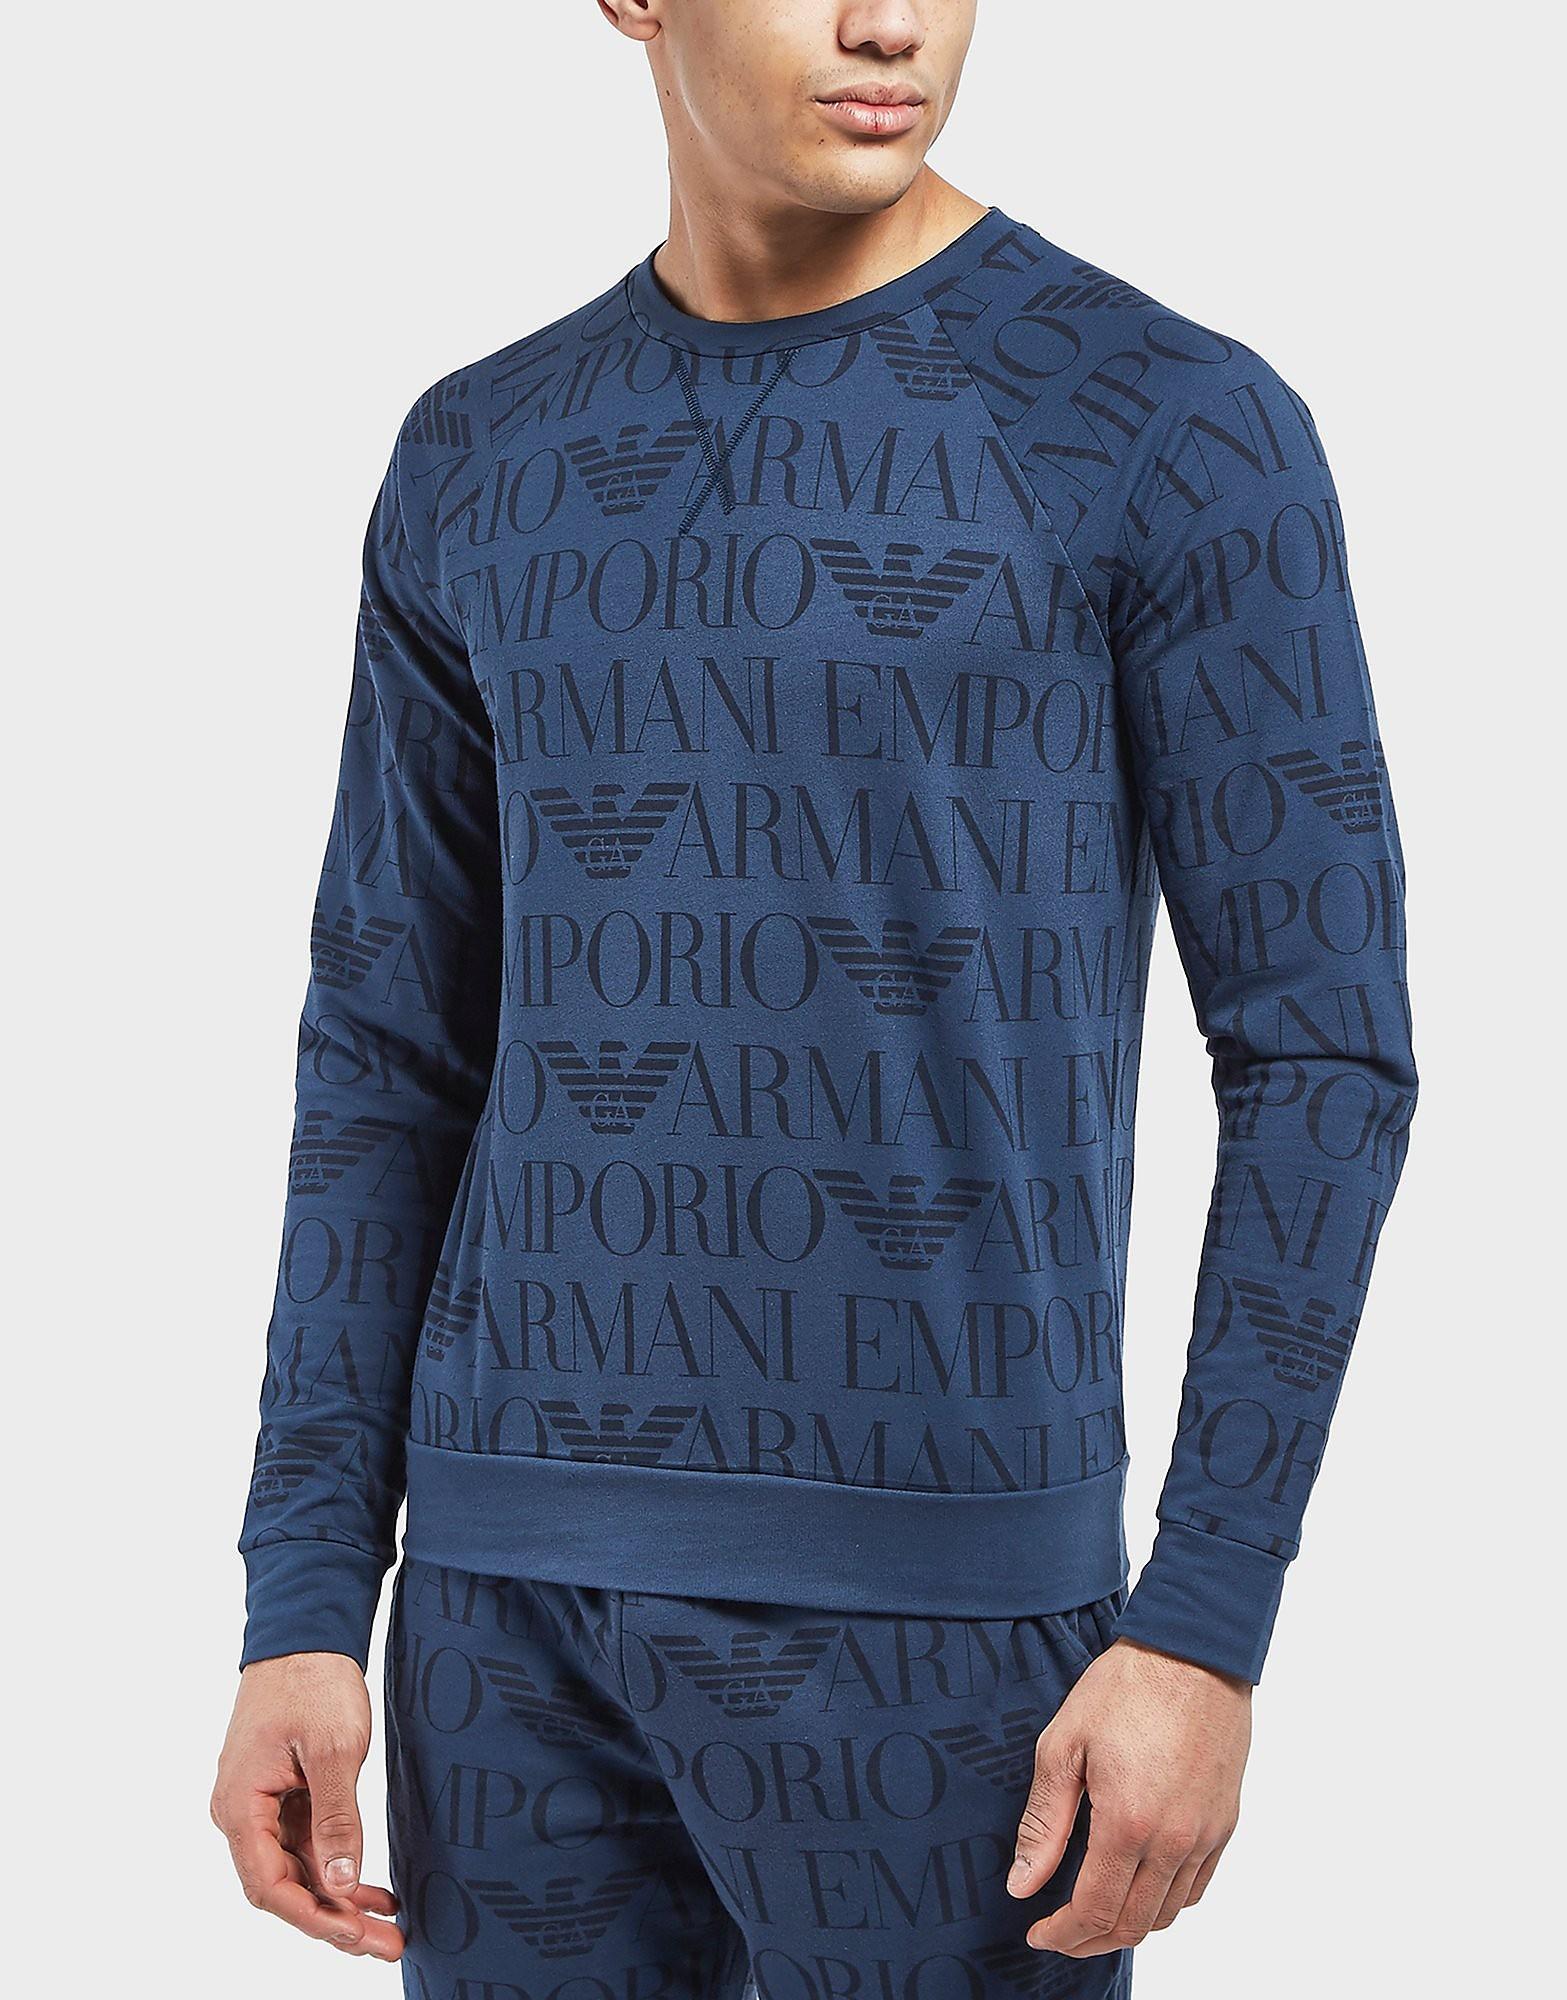 Emporio Armani All Over Print Sweatshirt